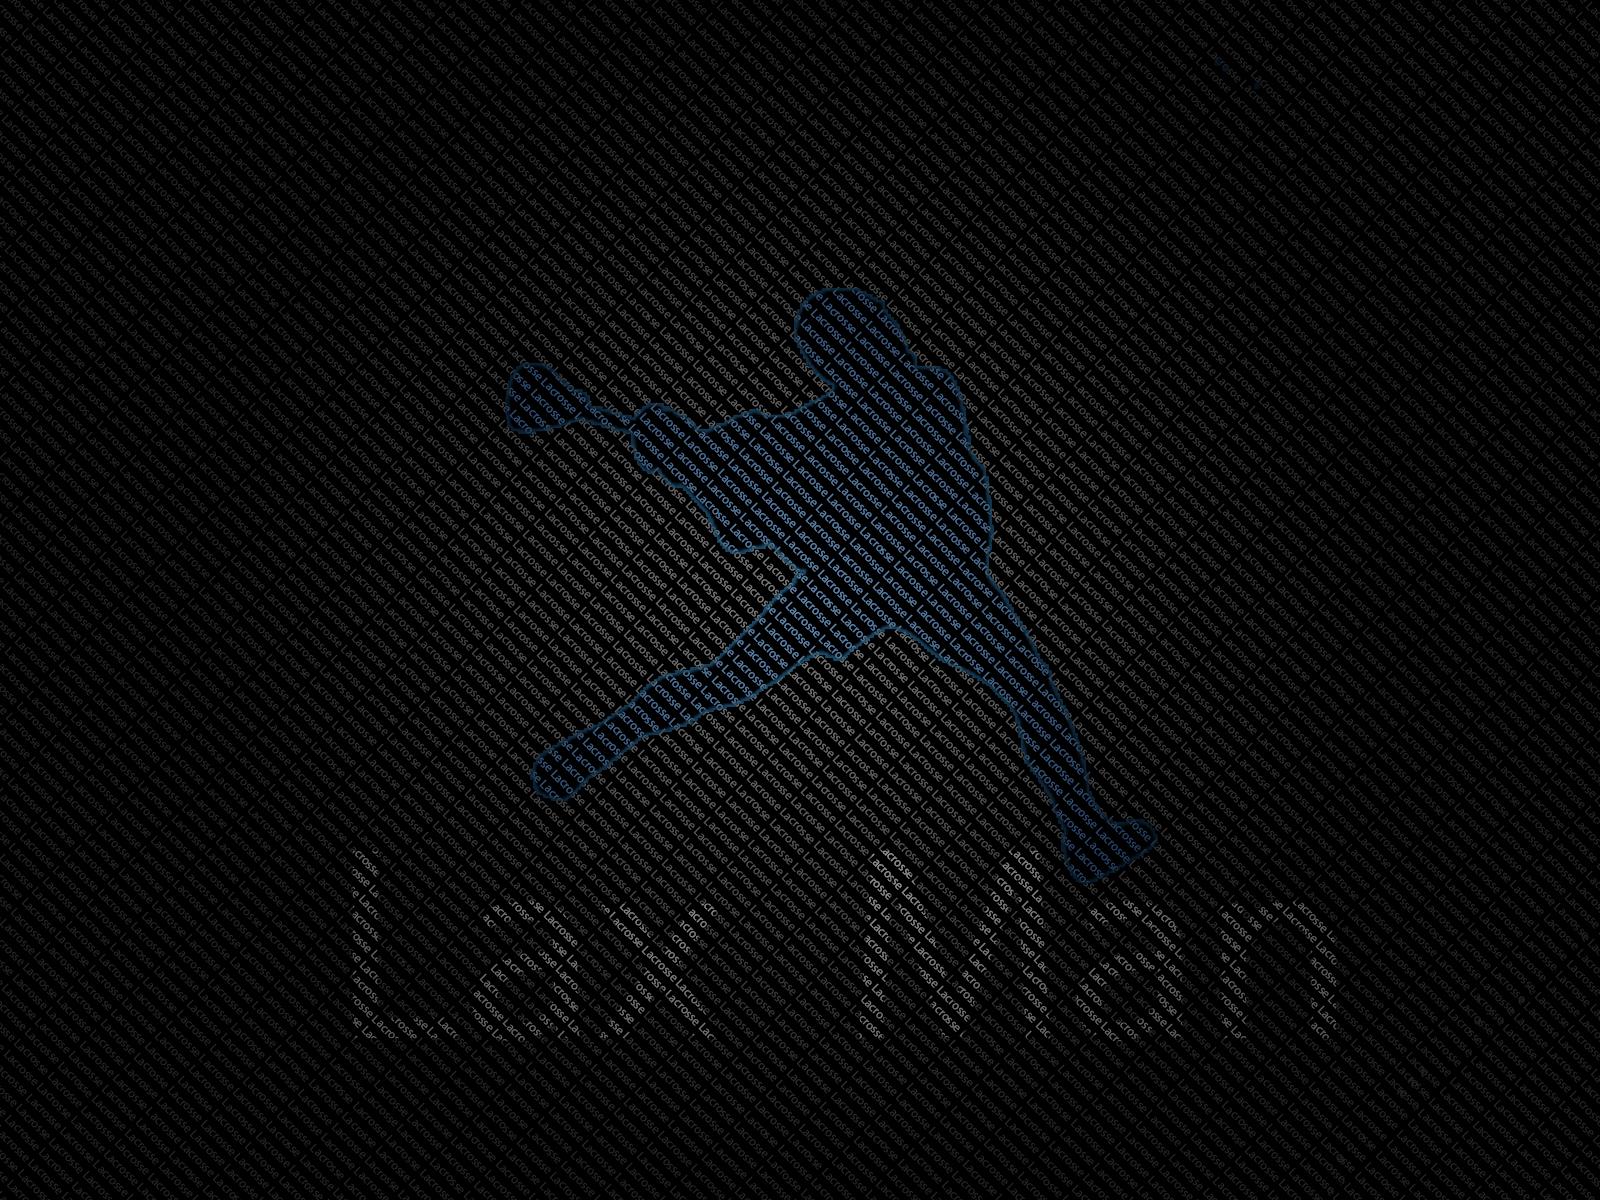 Lacrosse Wallpaper Hd: Lacrosse Wallpaper HD